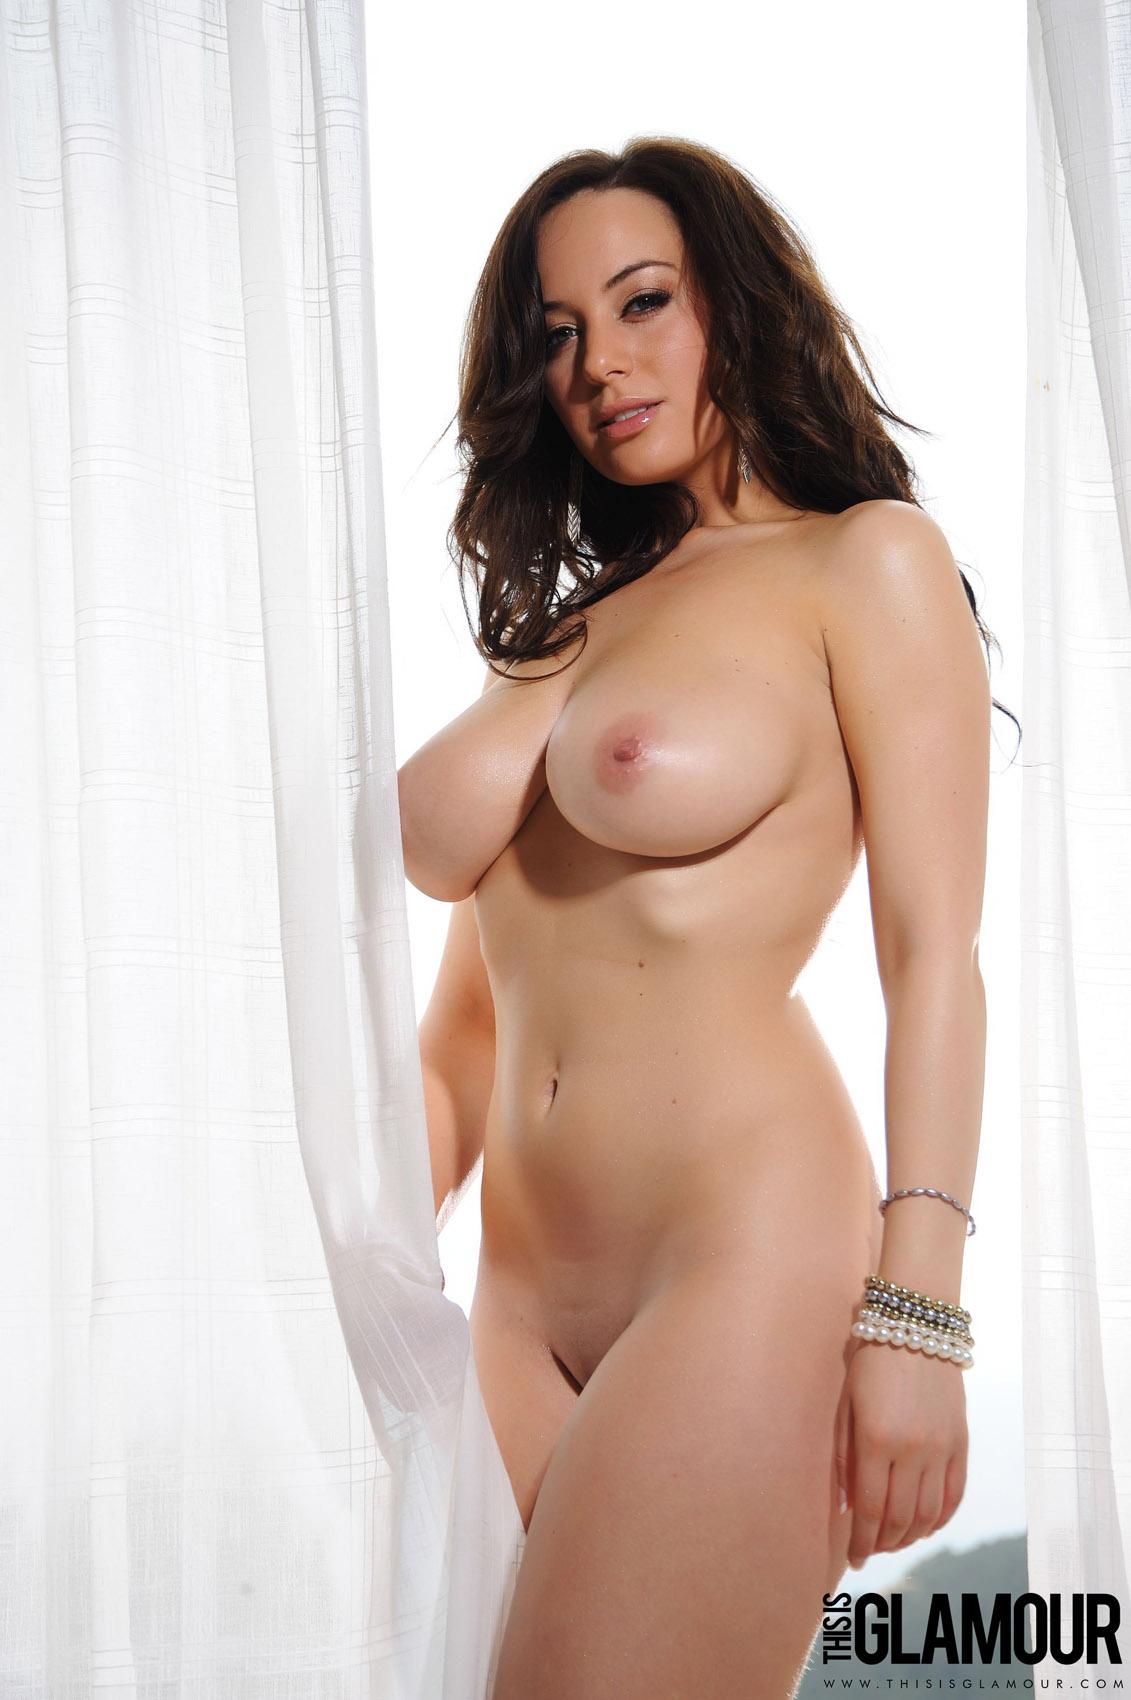 Big tits glamour models and pornstars galleries